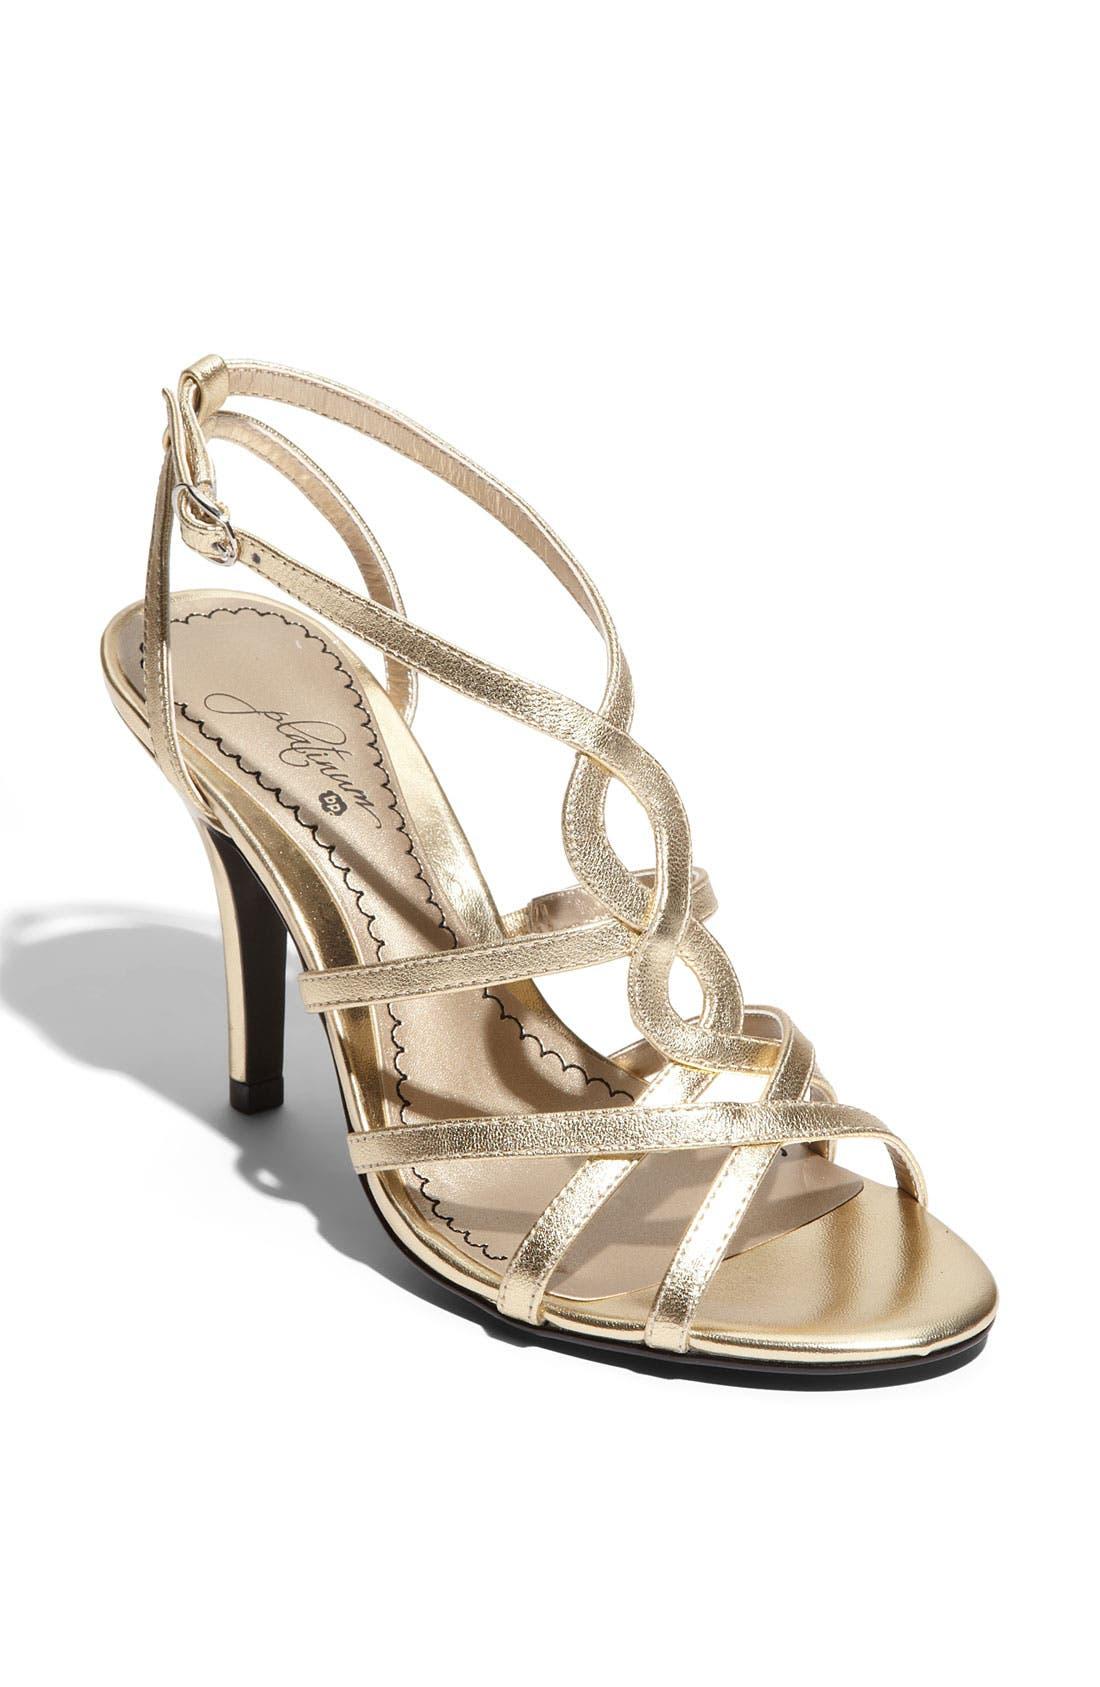 Alternate Image 1 Selected - BP. Platinum 'Twirl' Sandal